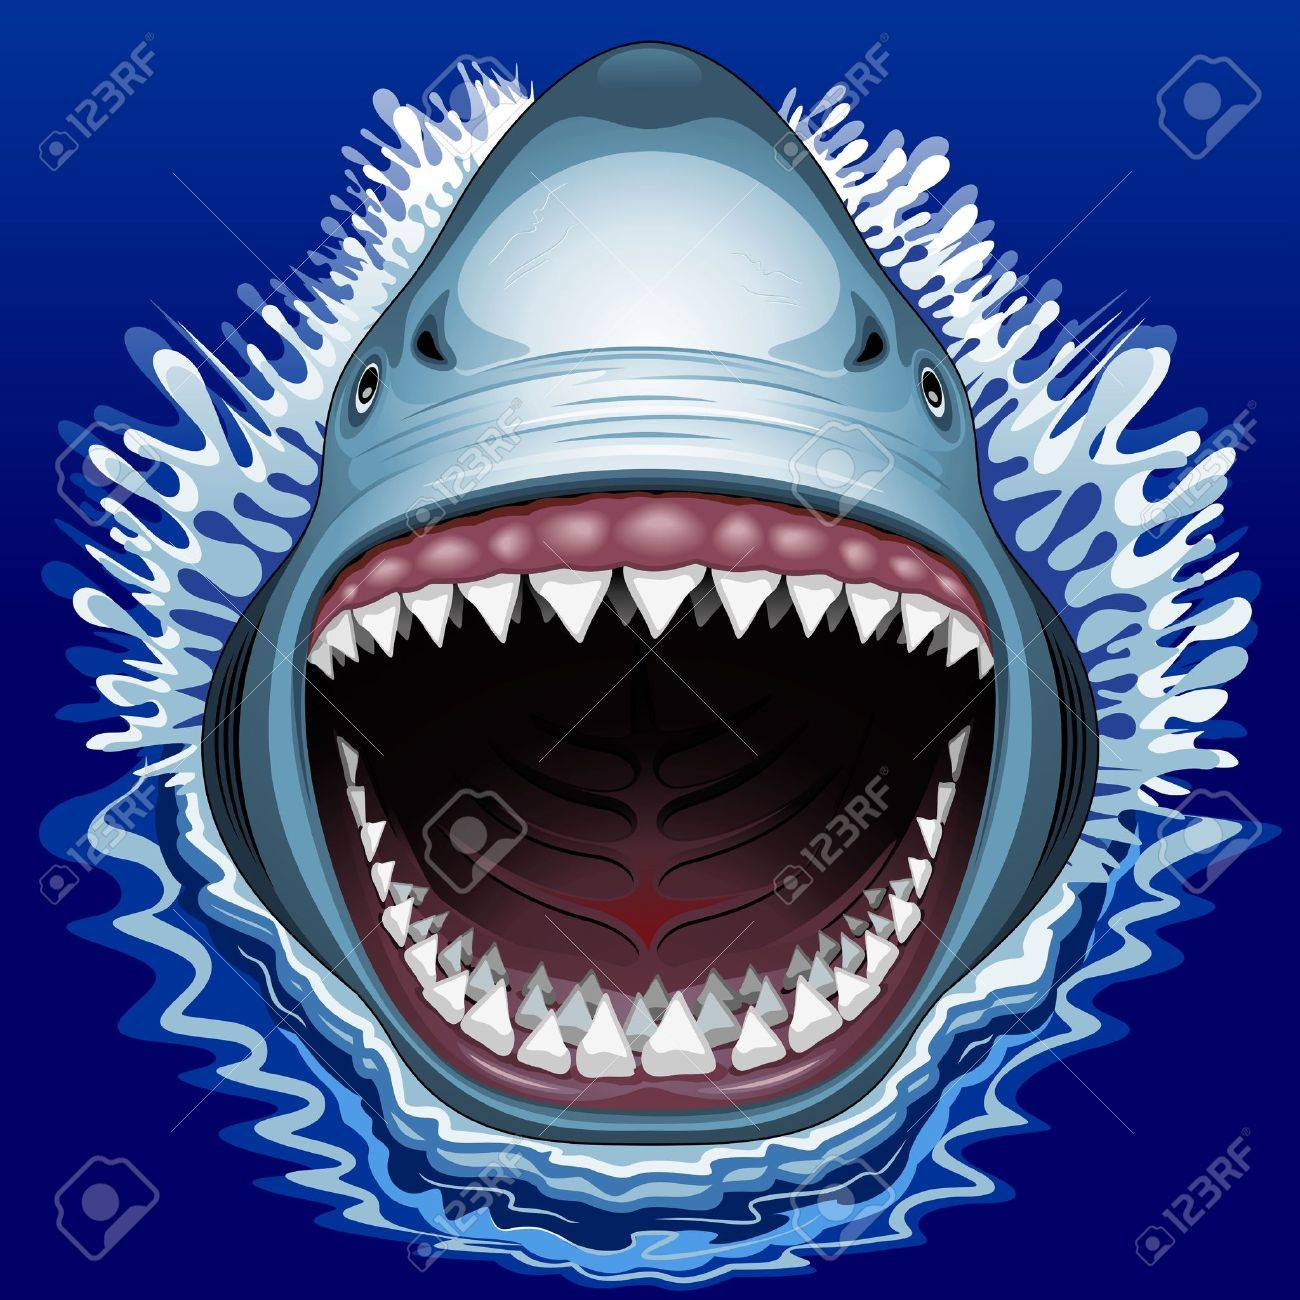 Shark Jaws Attack Stock Vector - 30557020